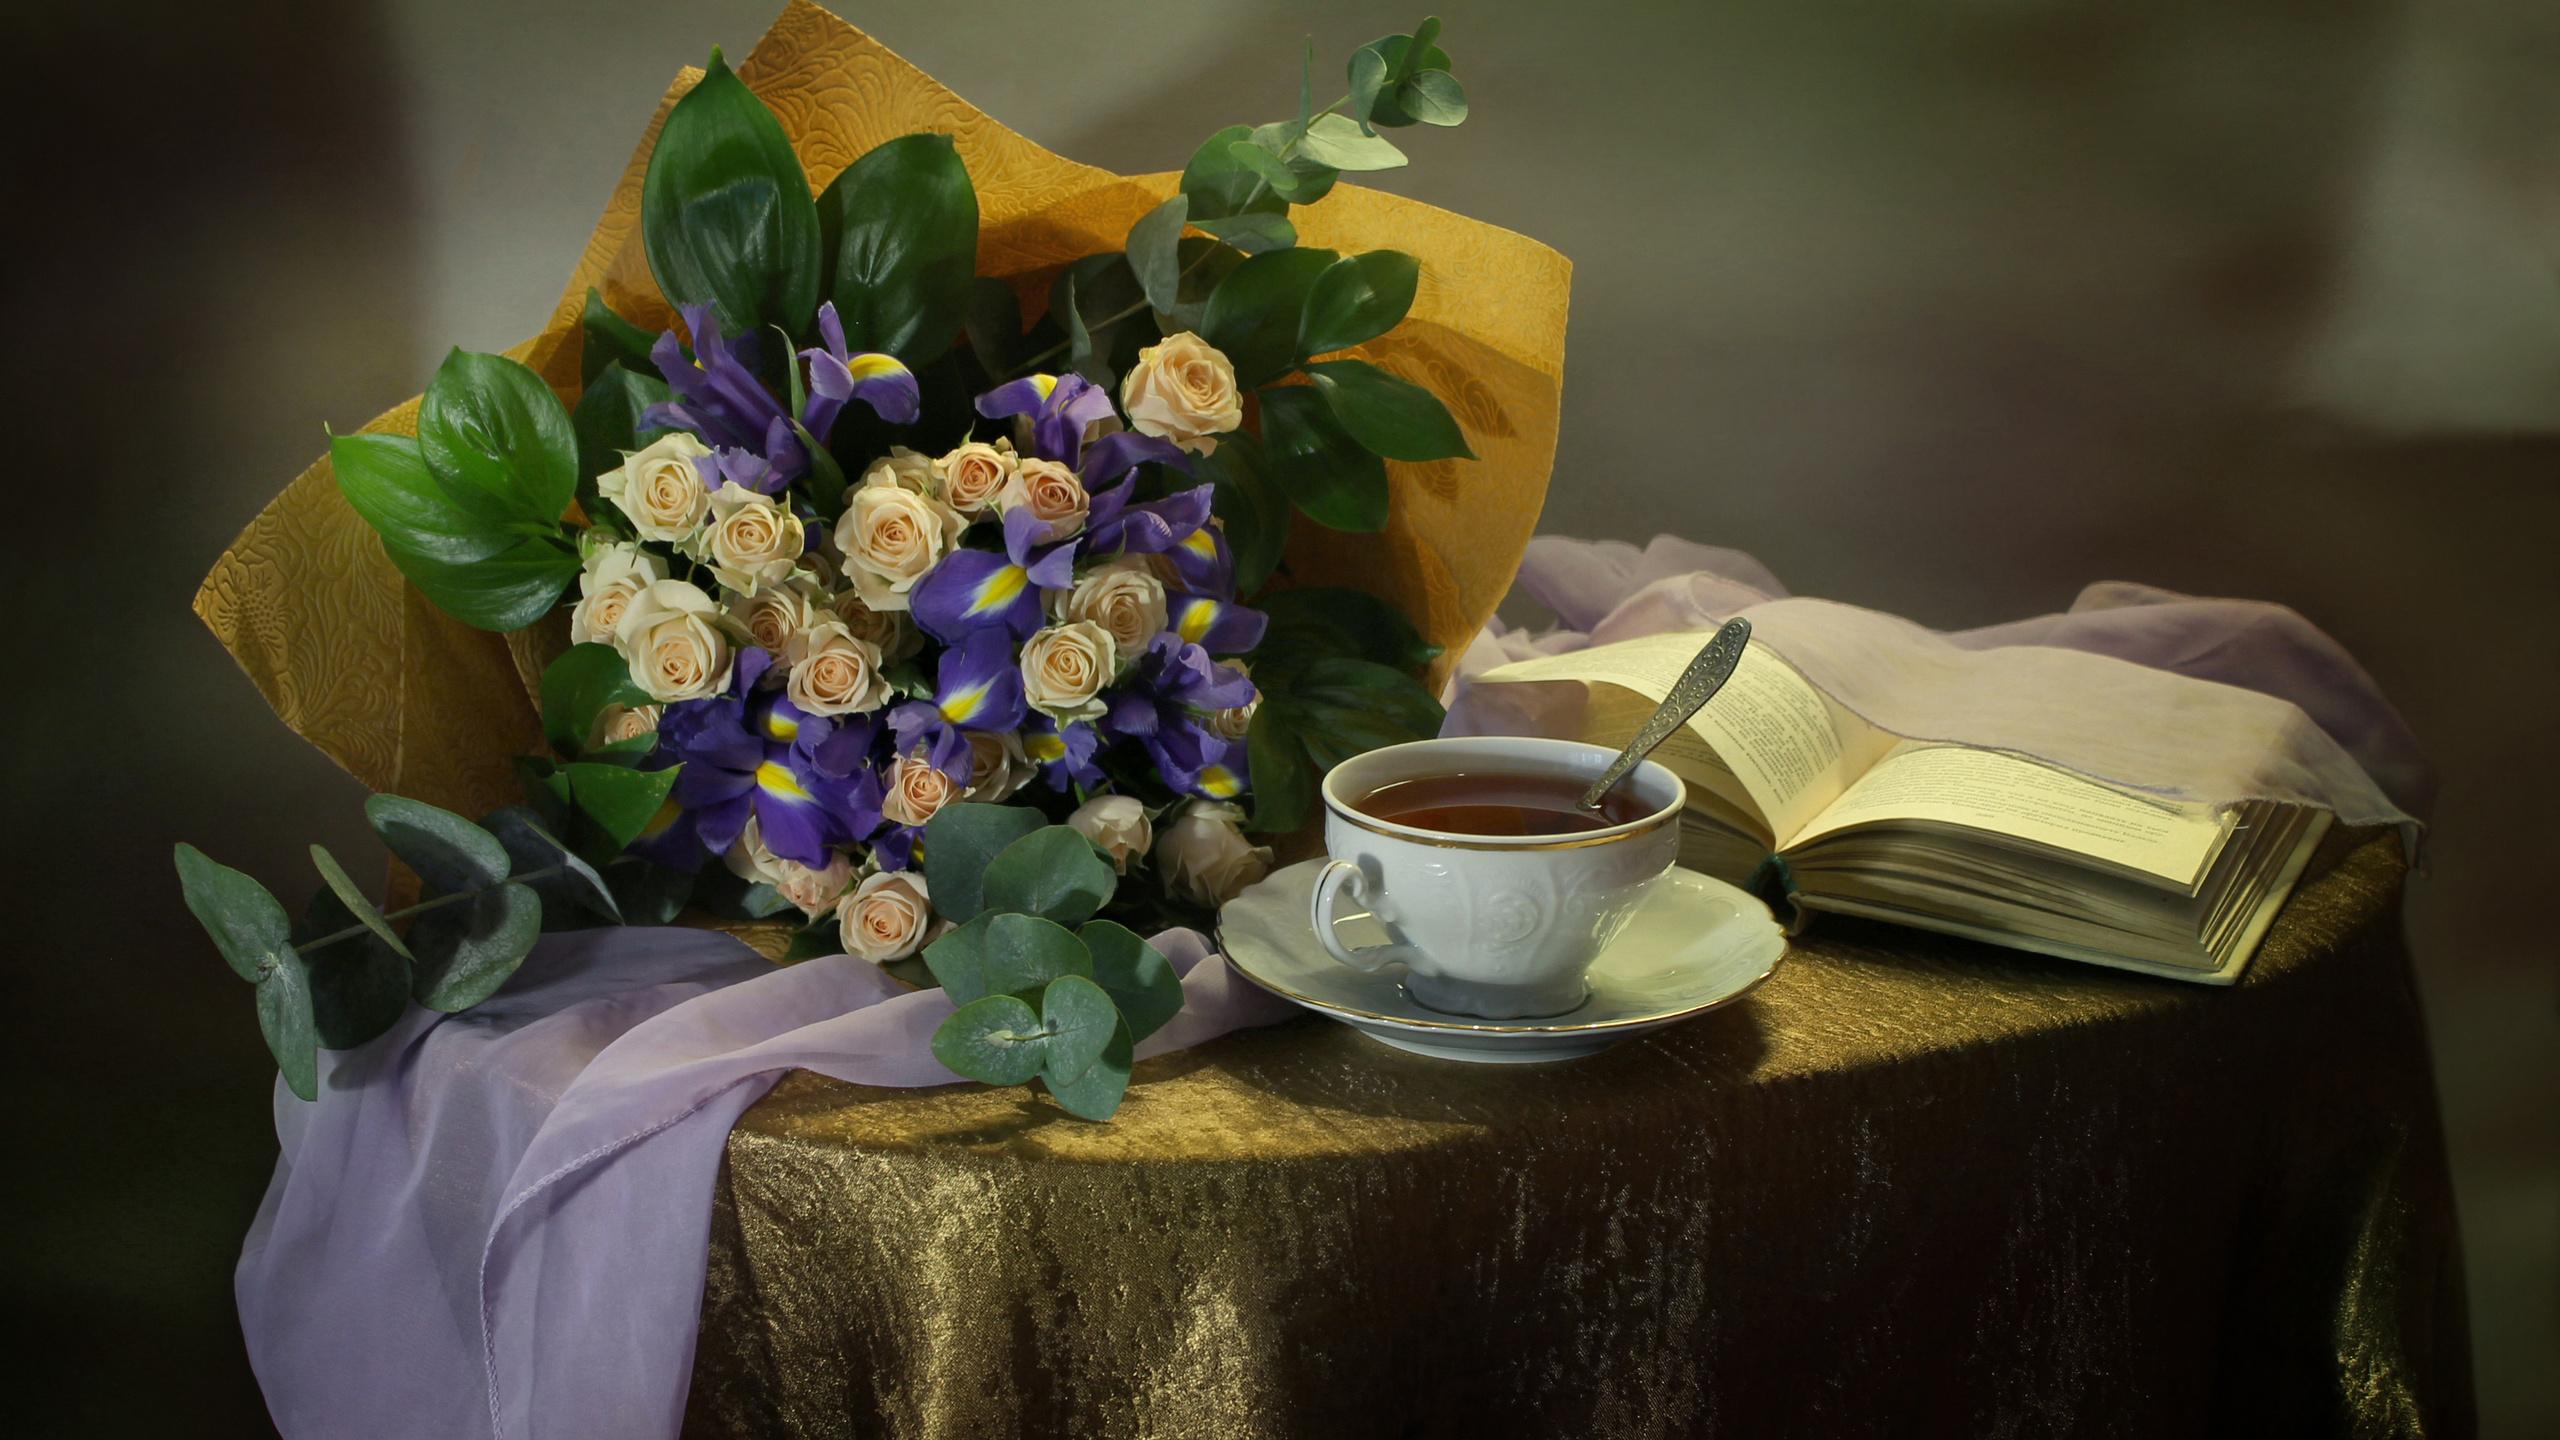 стол, покрывало, натюрморт, цветы, розы, ирисы, платок, книга, чашка